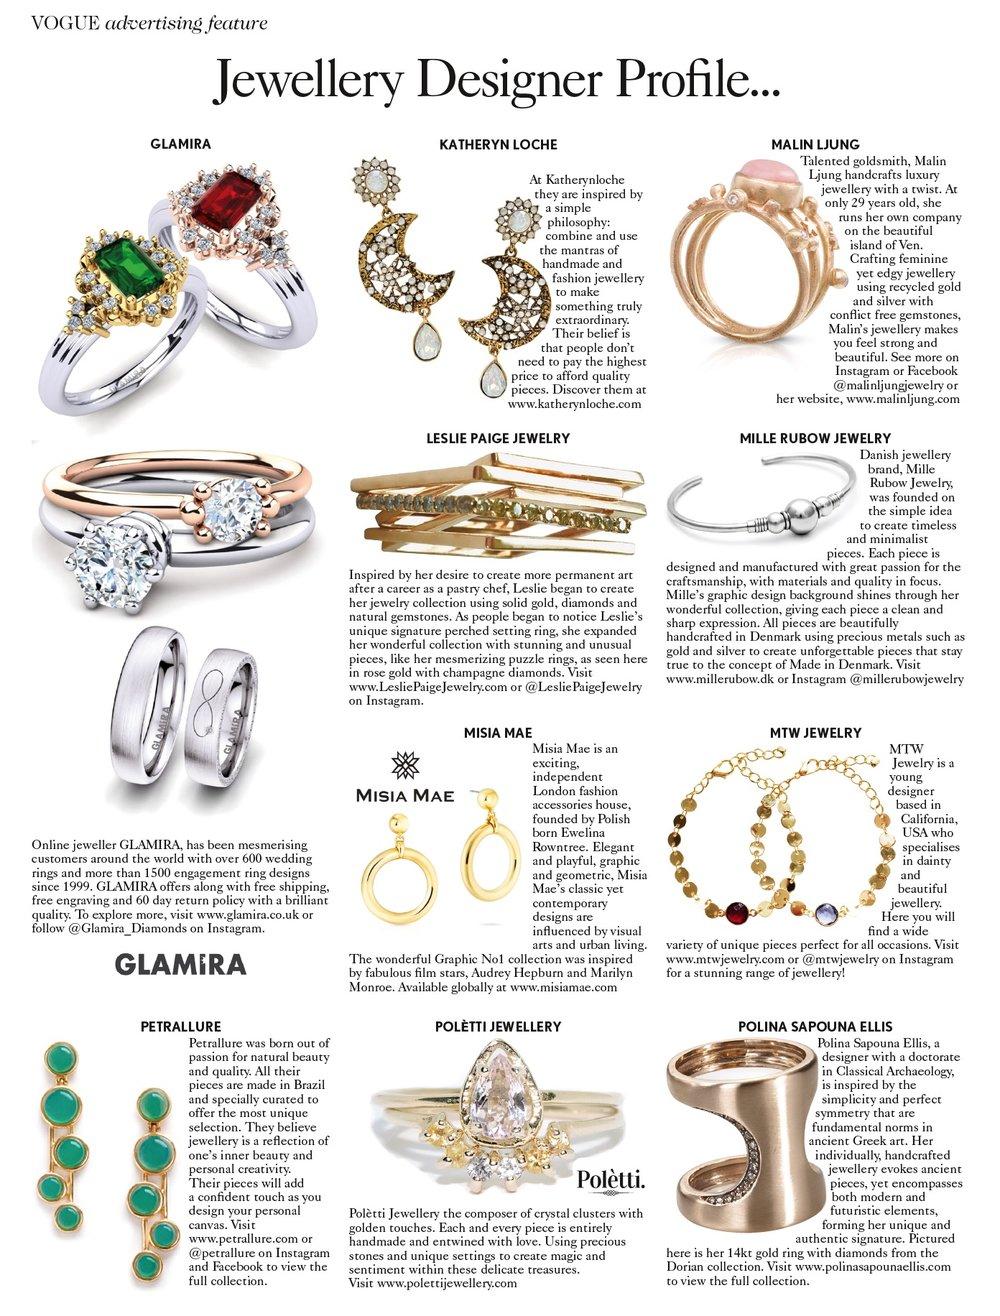 378 Jewellery Designer Profile.jpg